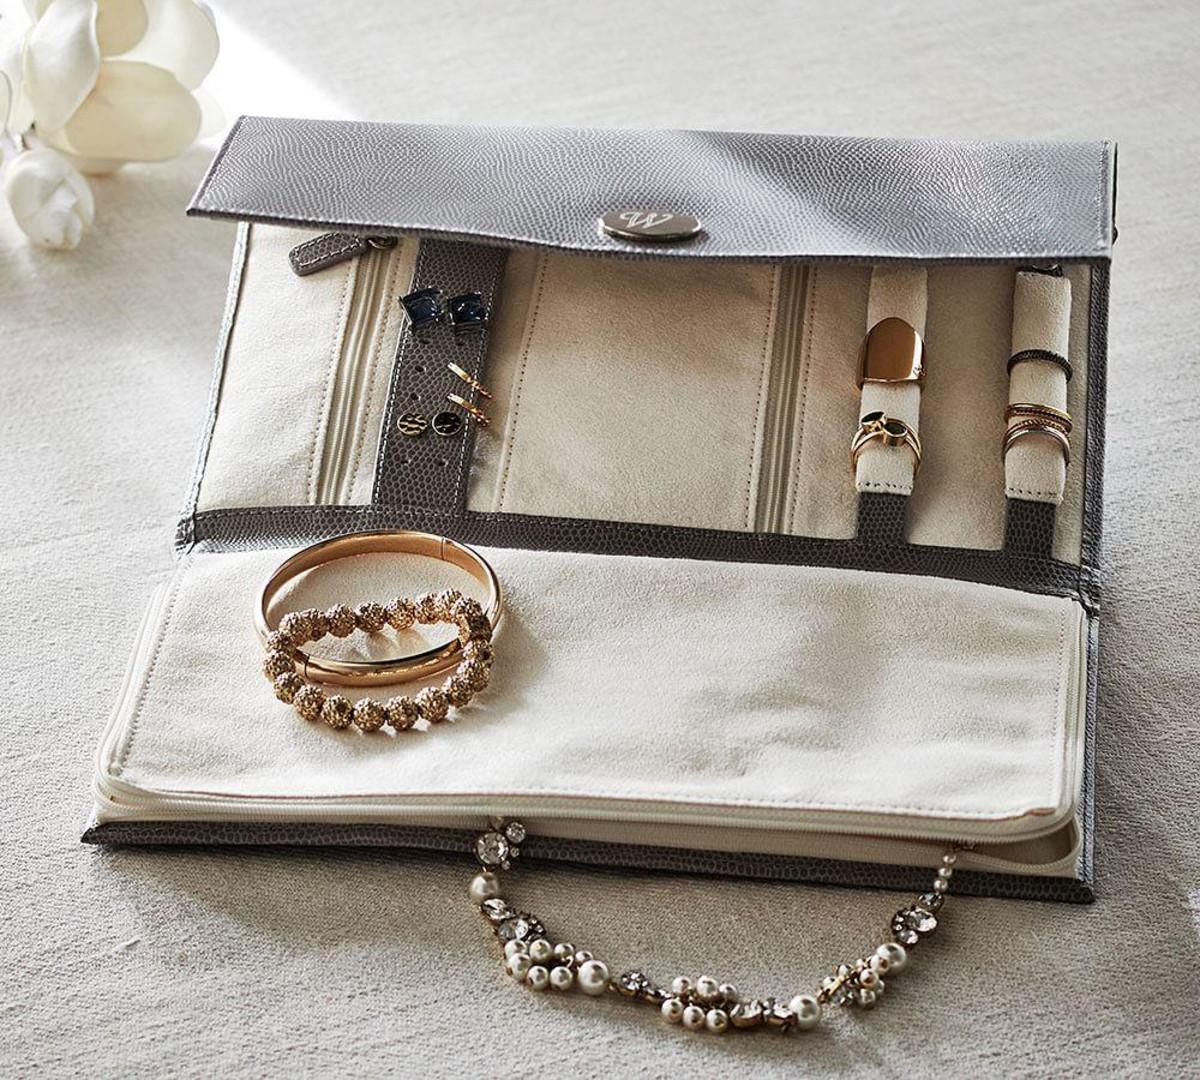 Leather Travel Jewelry Portfolio $79